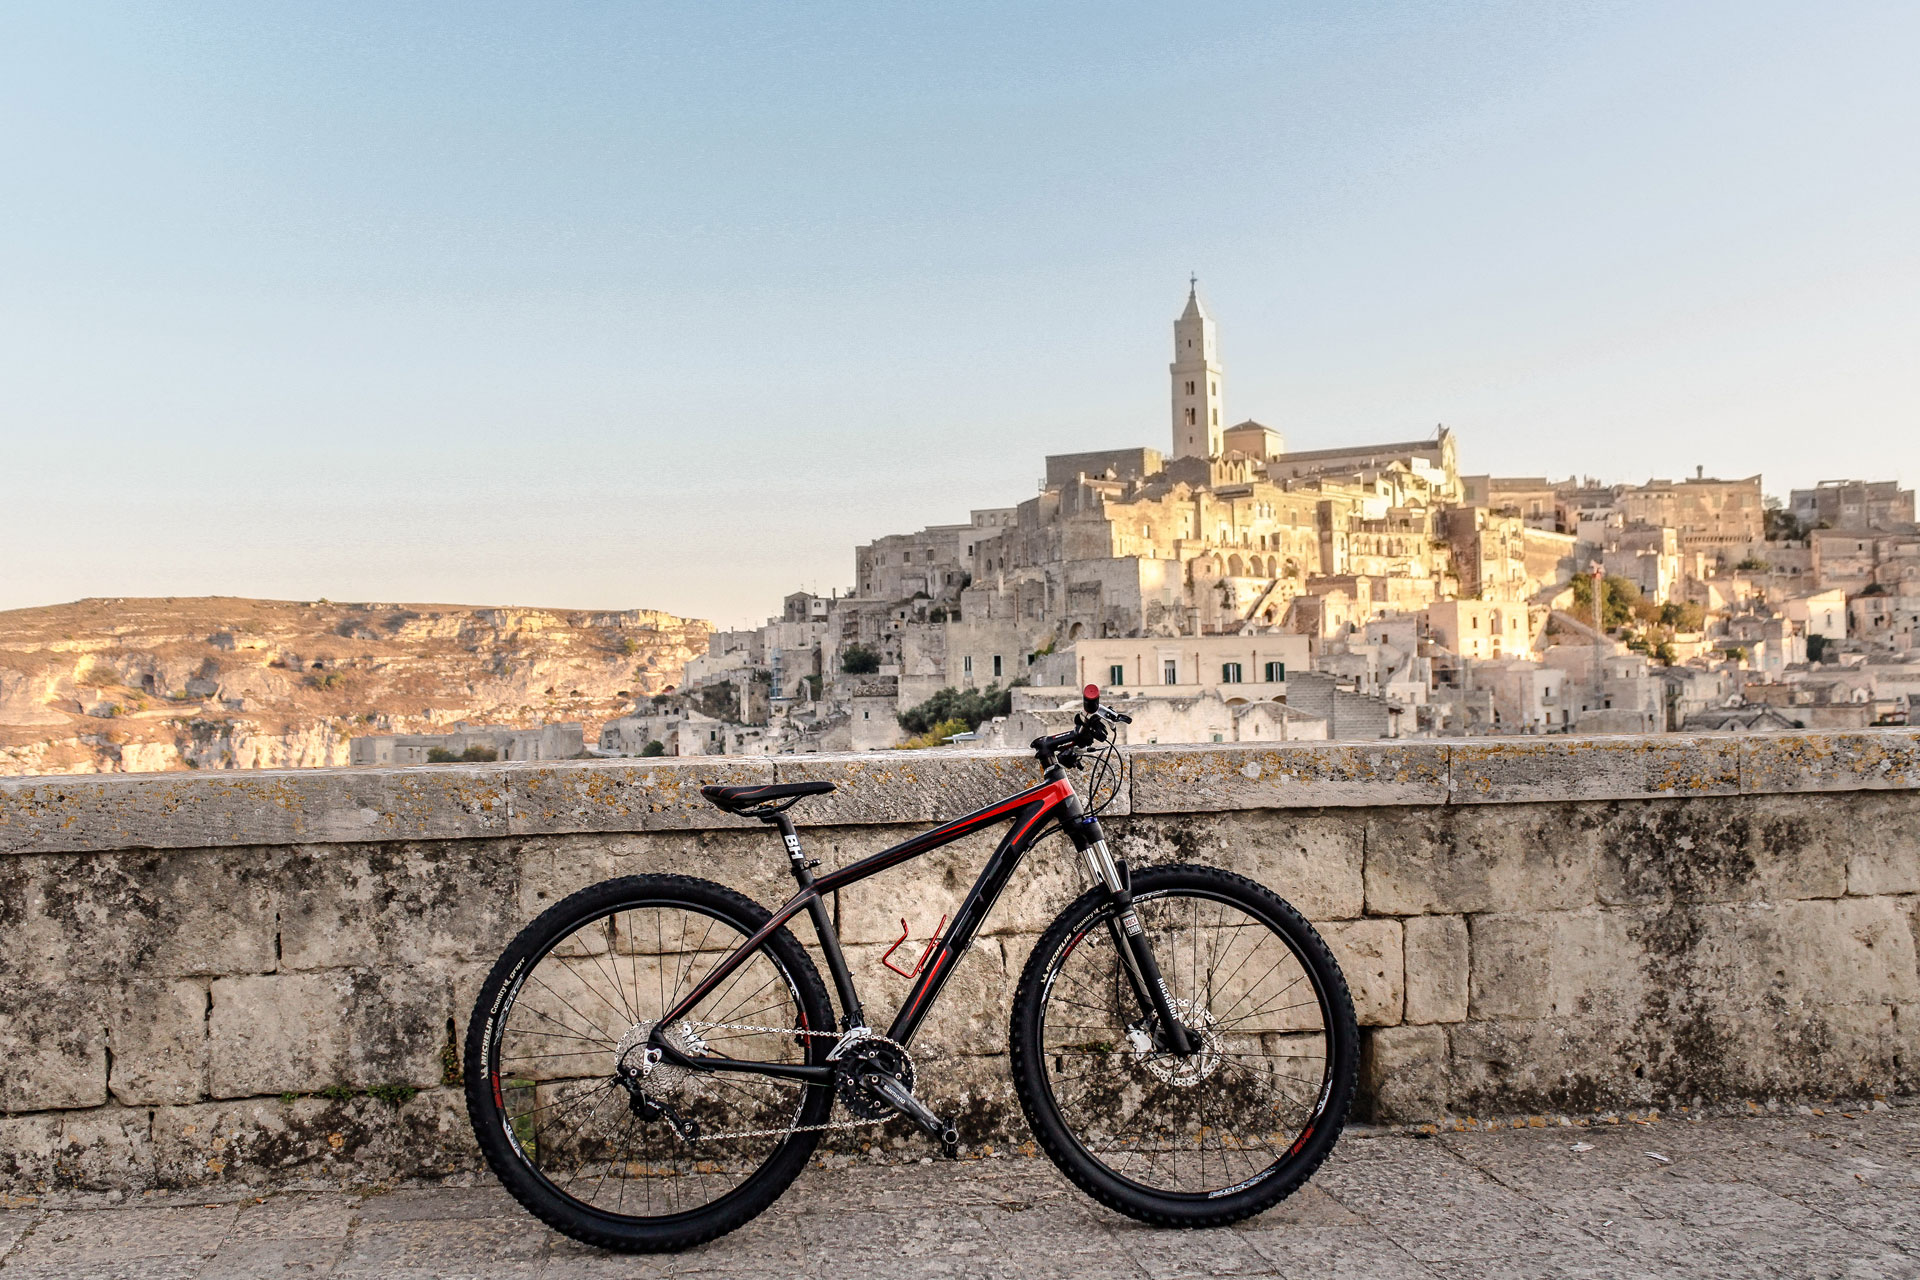 bh-bikes-expert-mtb-matera-sassi